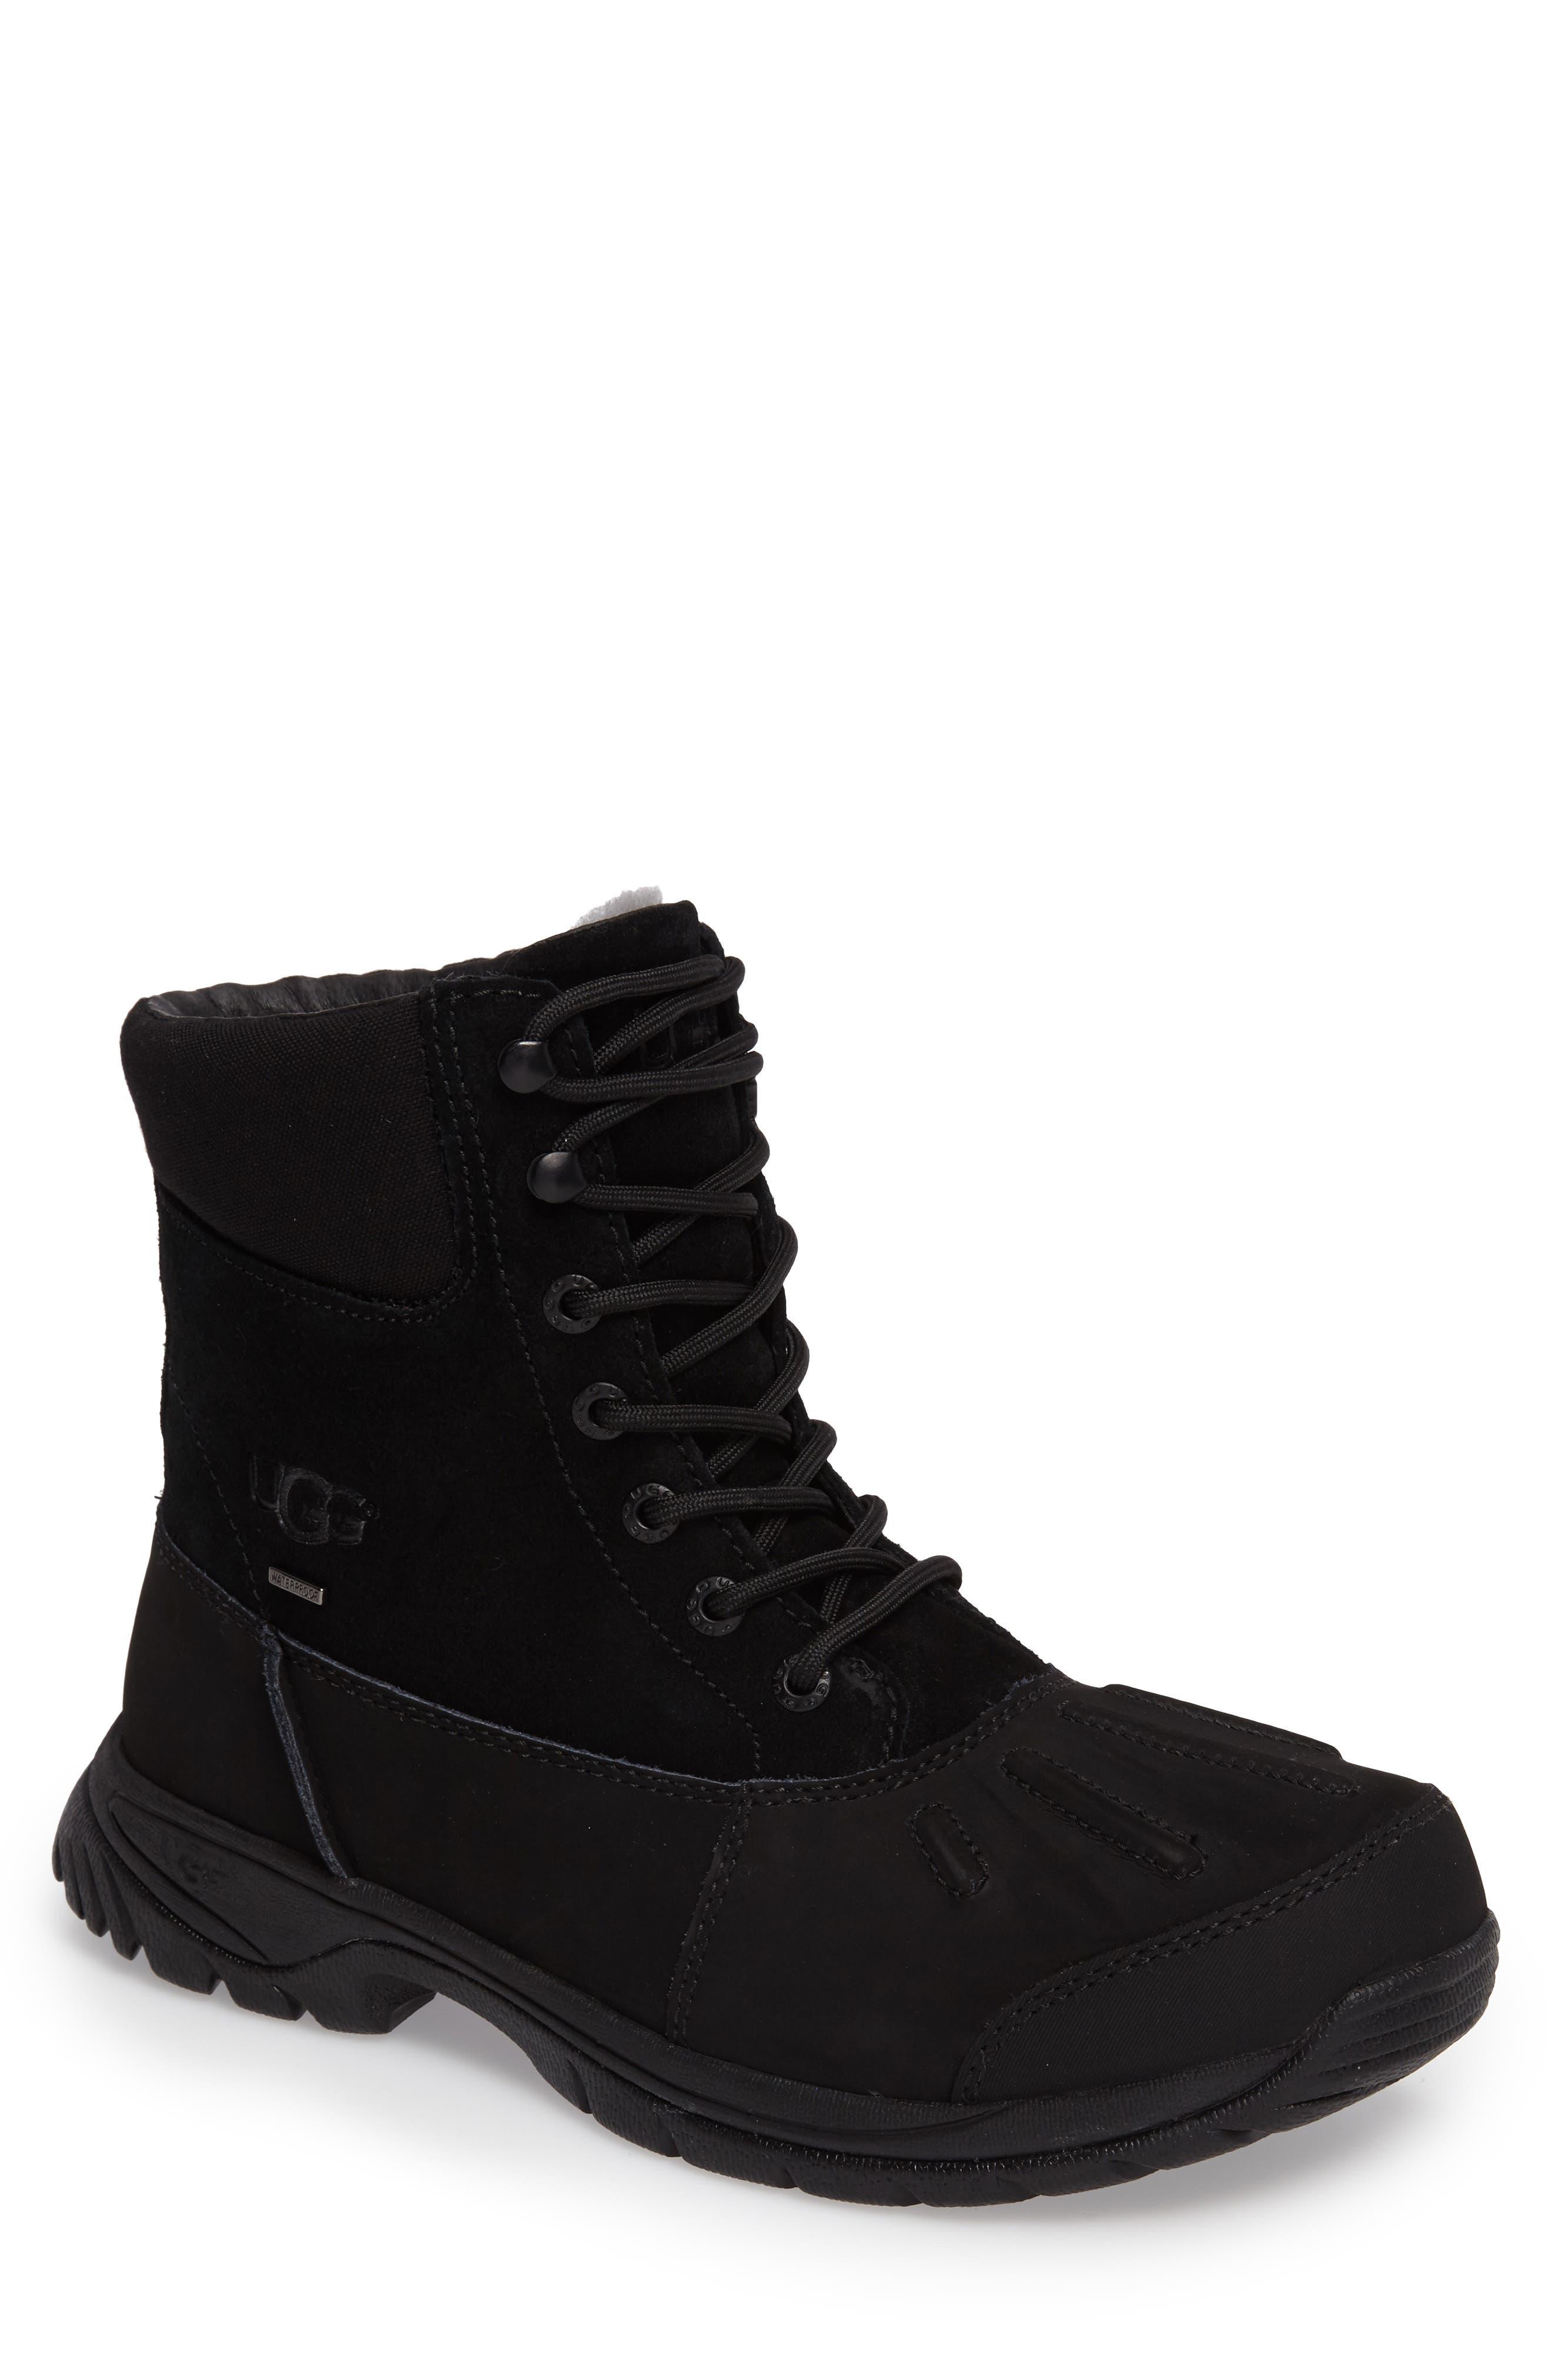 'Metcalf' Snow Boot, Main, color, 001